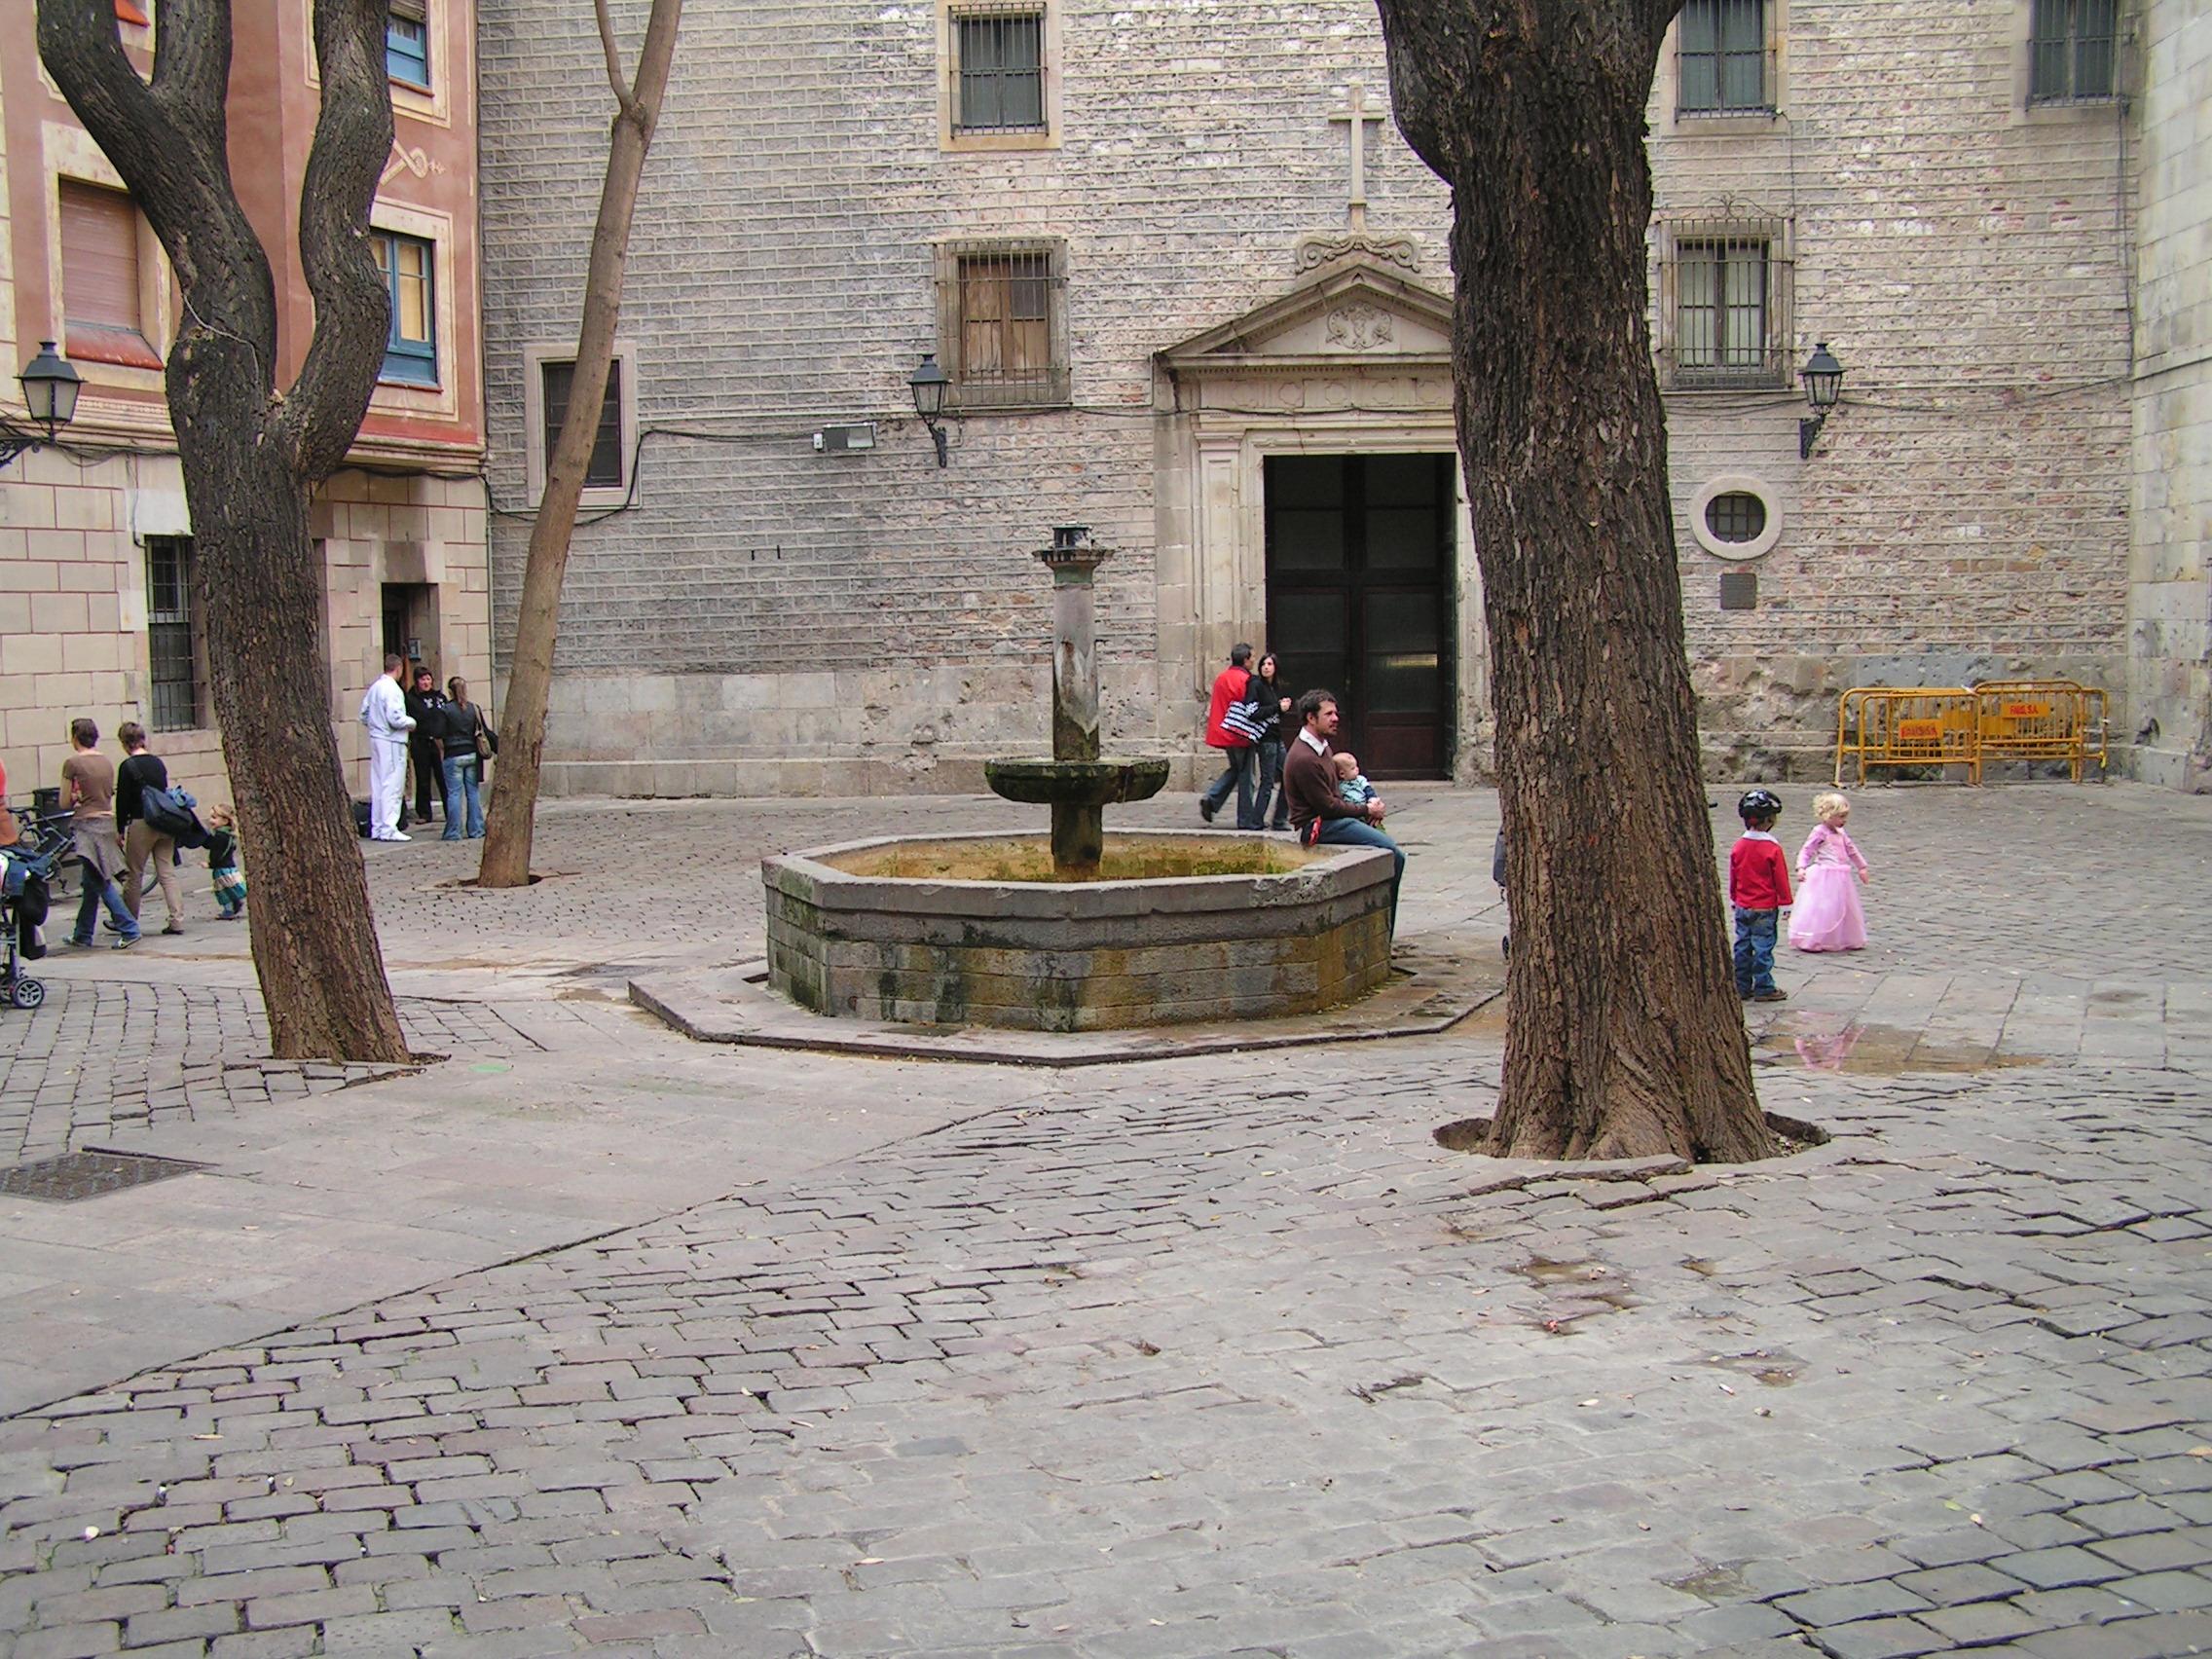 La plaza Sant Felip Neri de Barcelona